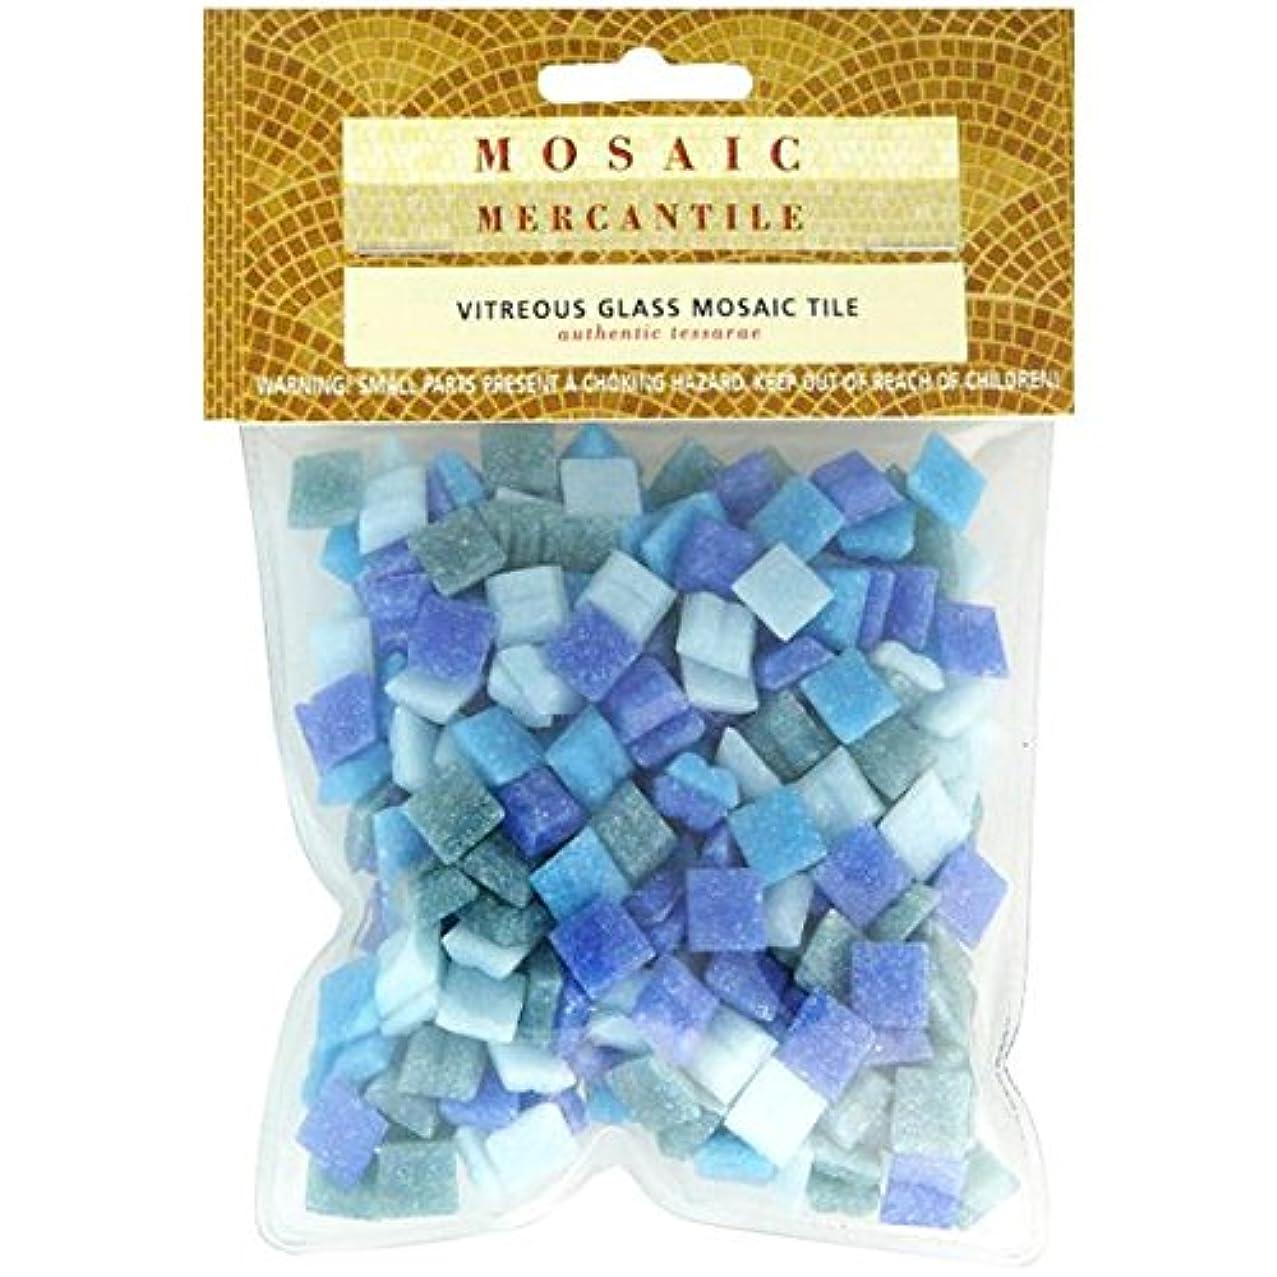 Mosaic Mercantile Minimix Seascape Mosaic Tiles, 1/2-Pound